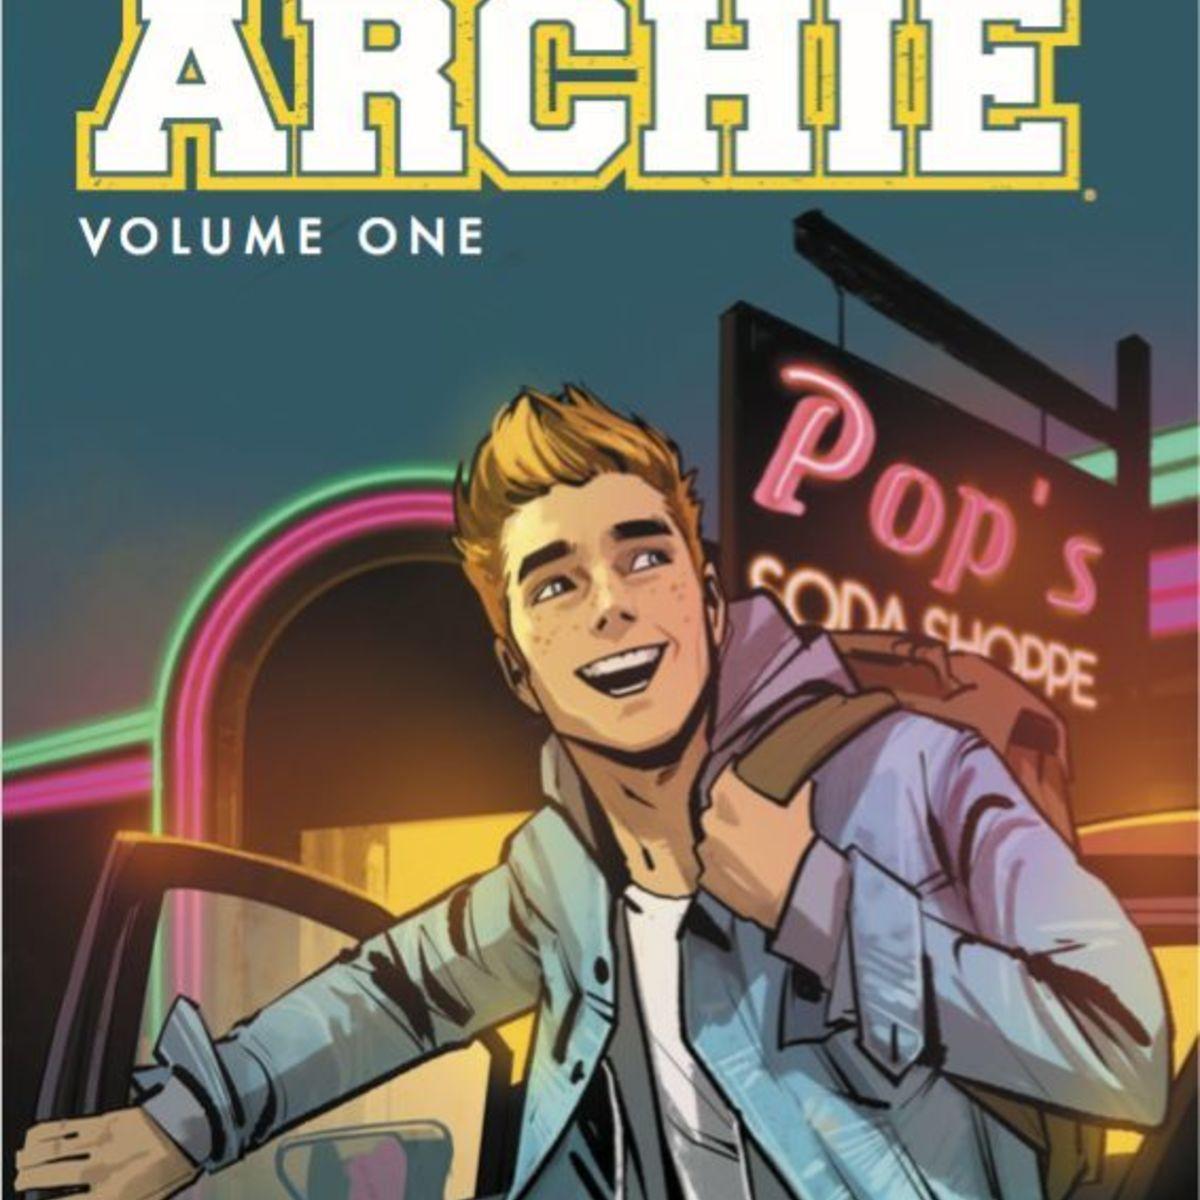 Archie Comics- Volume 1 cover (Waid/Staples)